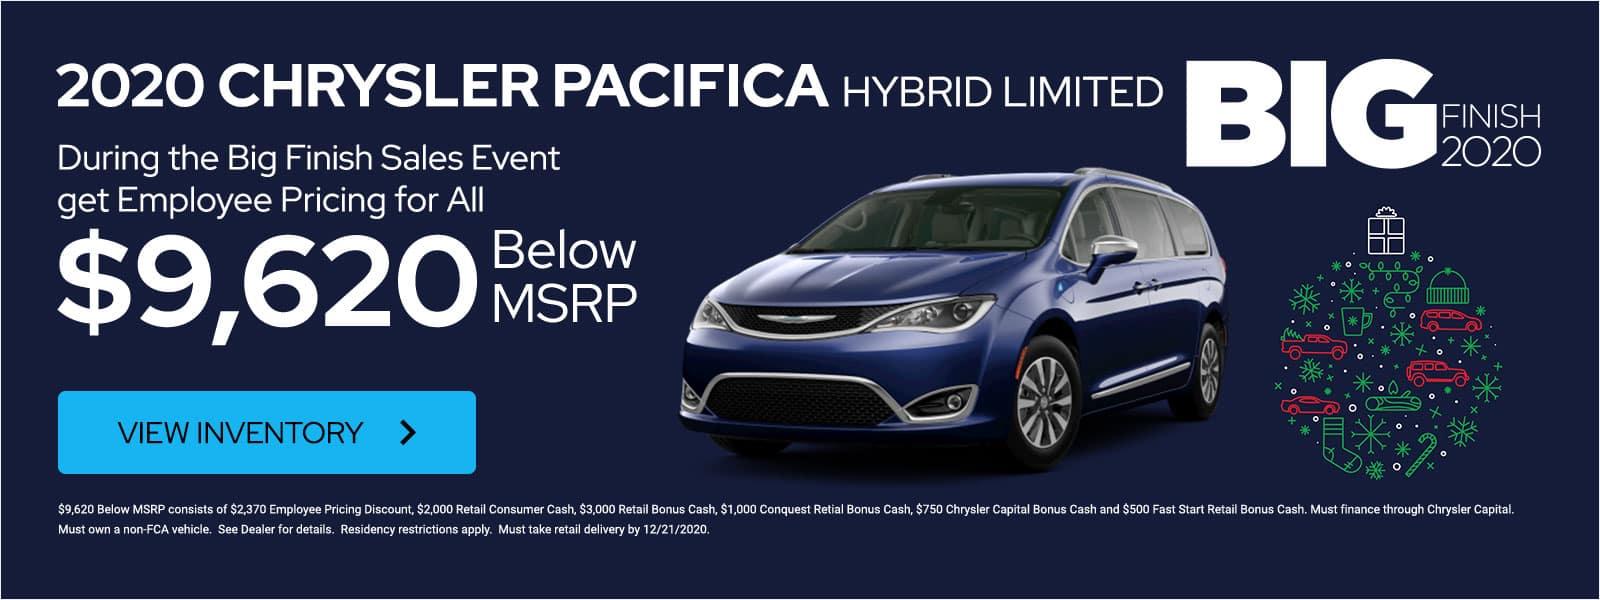 MABC_Banners_1600x600_2020-12_509913_20-Chrysler-Pacifica-Hybrid